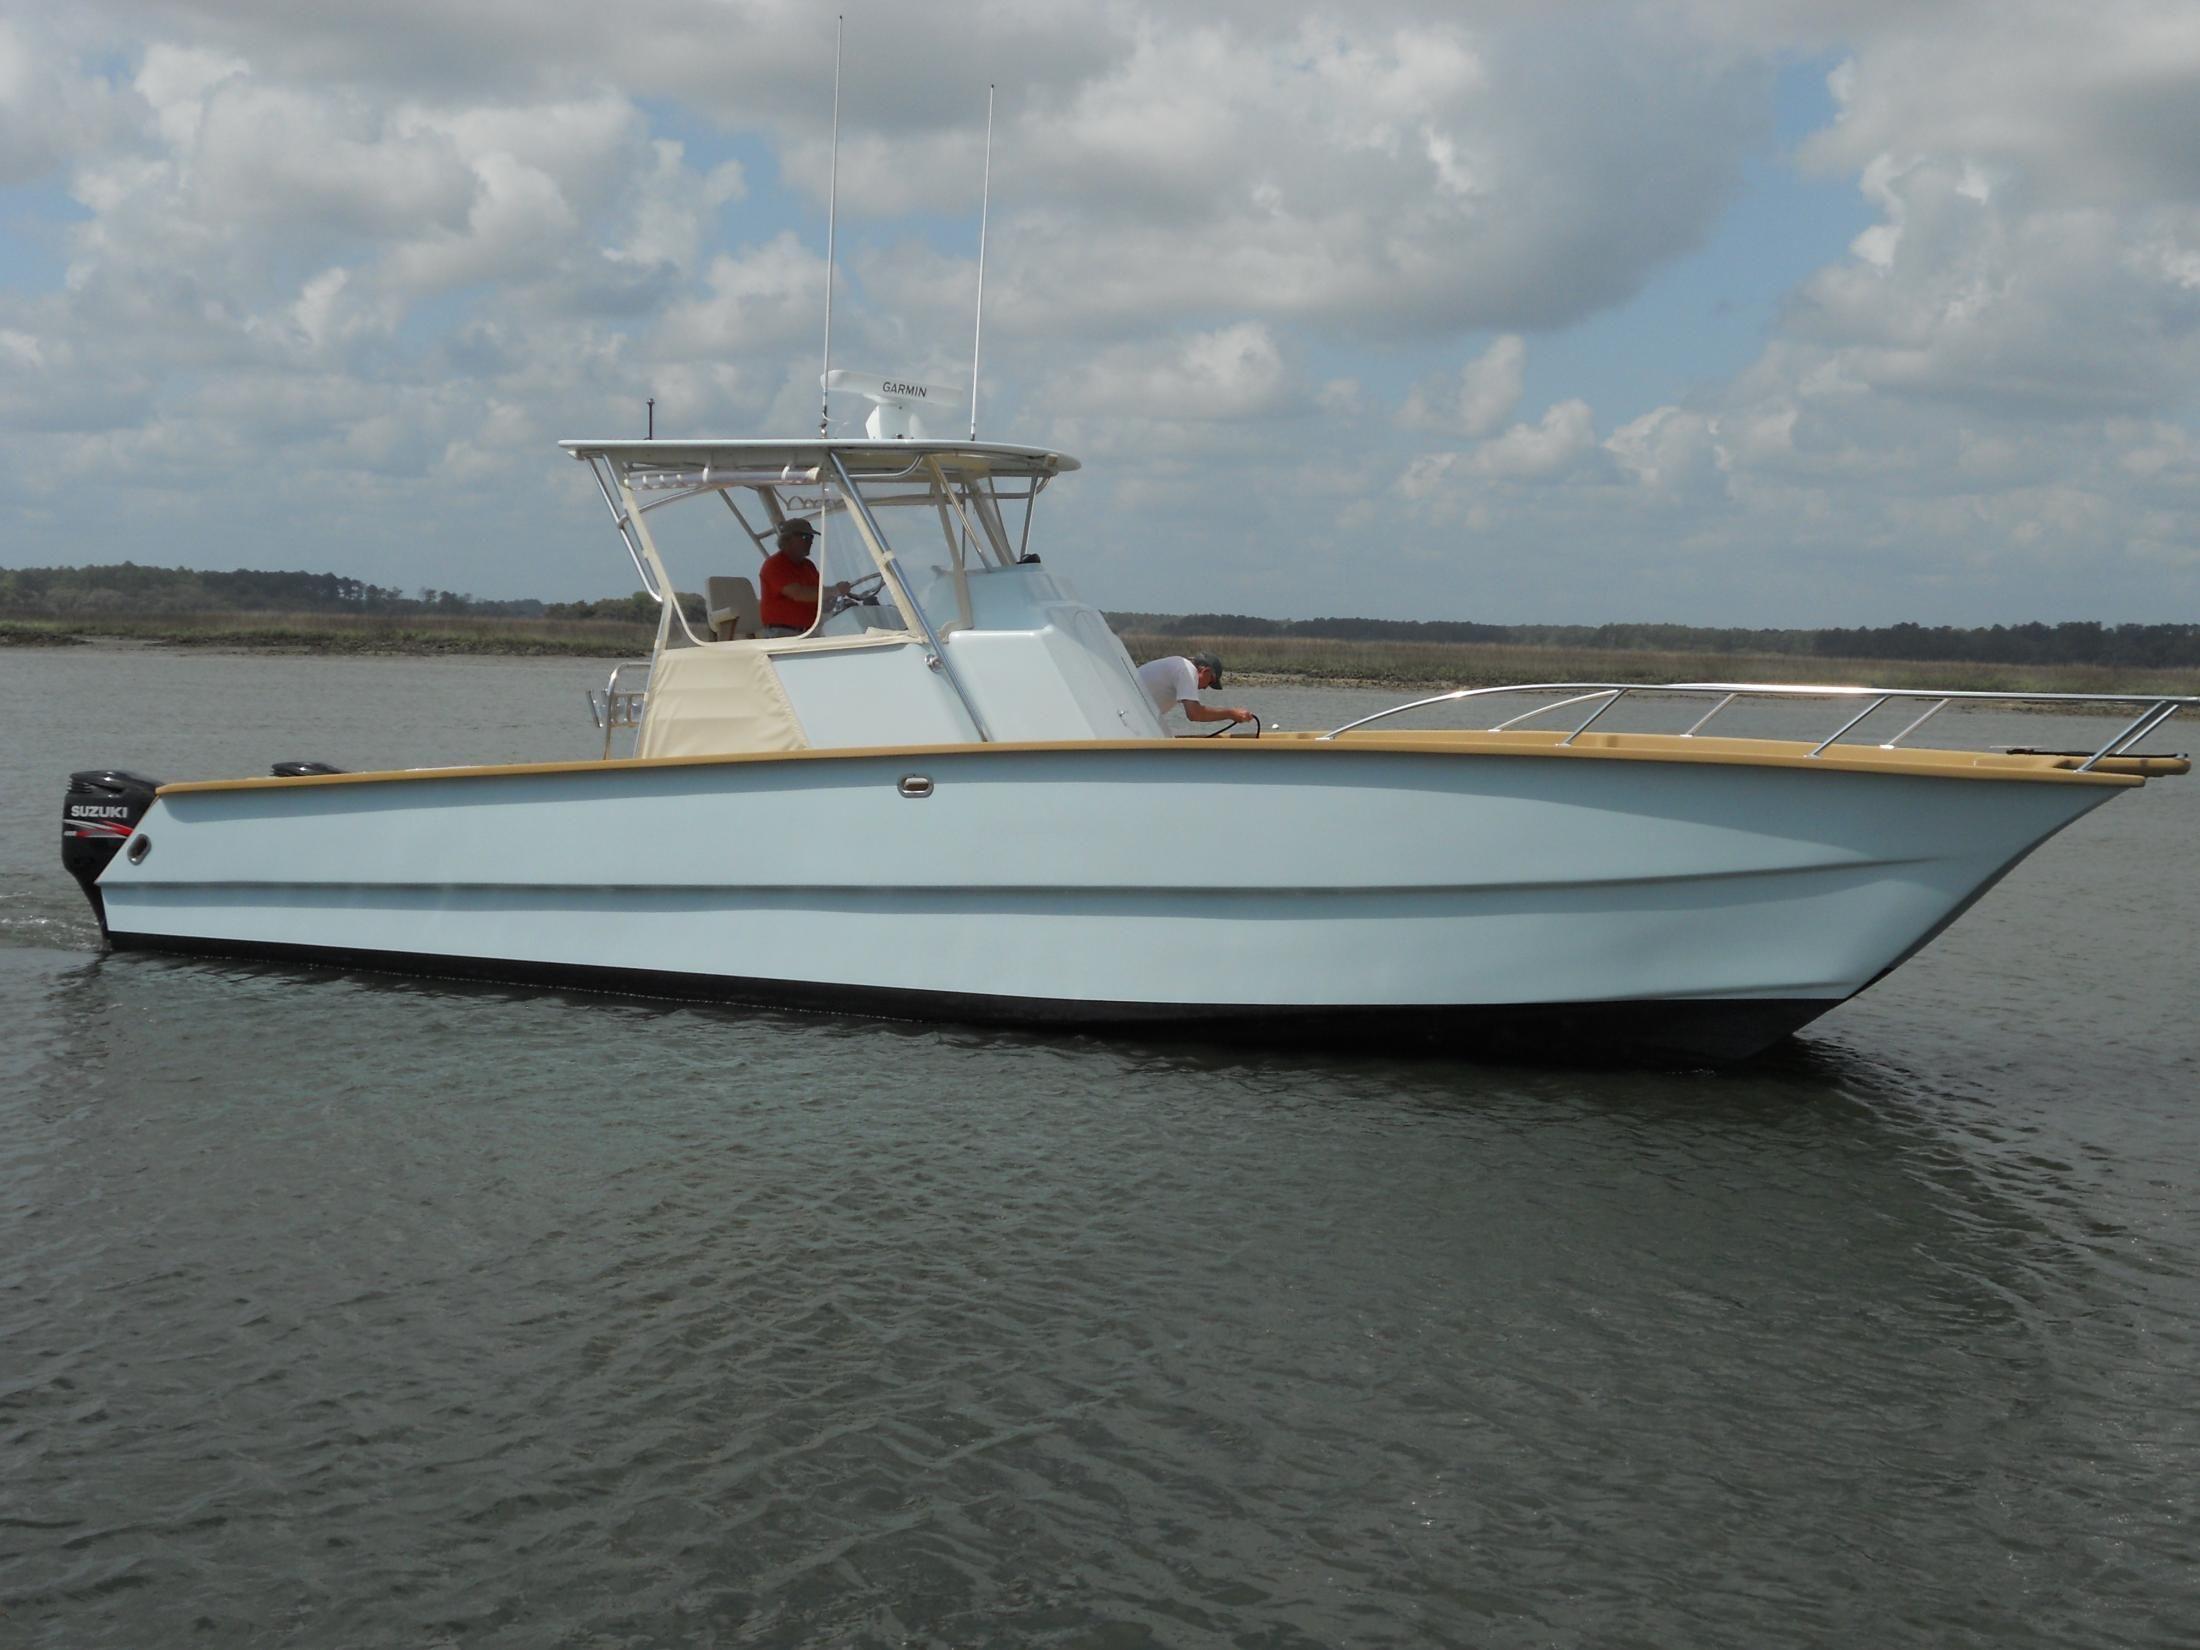 2011 Mike Scearce Design 42 SPORTFISH CATAMARAN Power Boat ...  2011 Mike Scear...